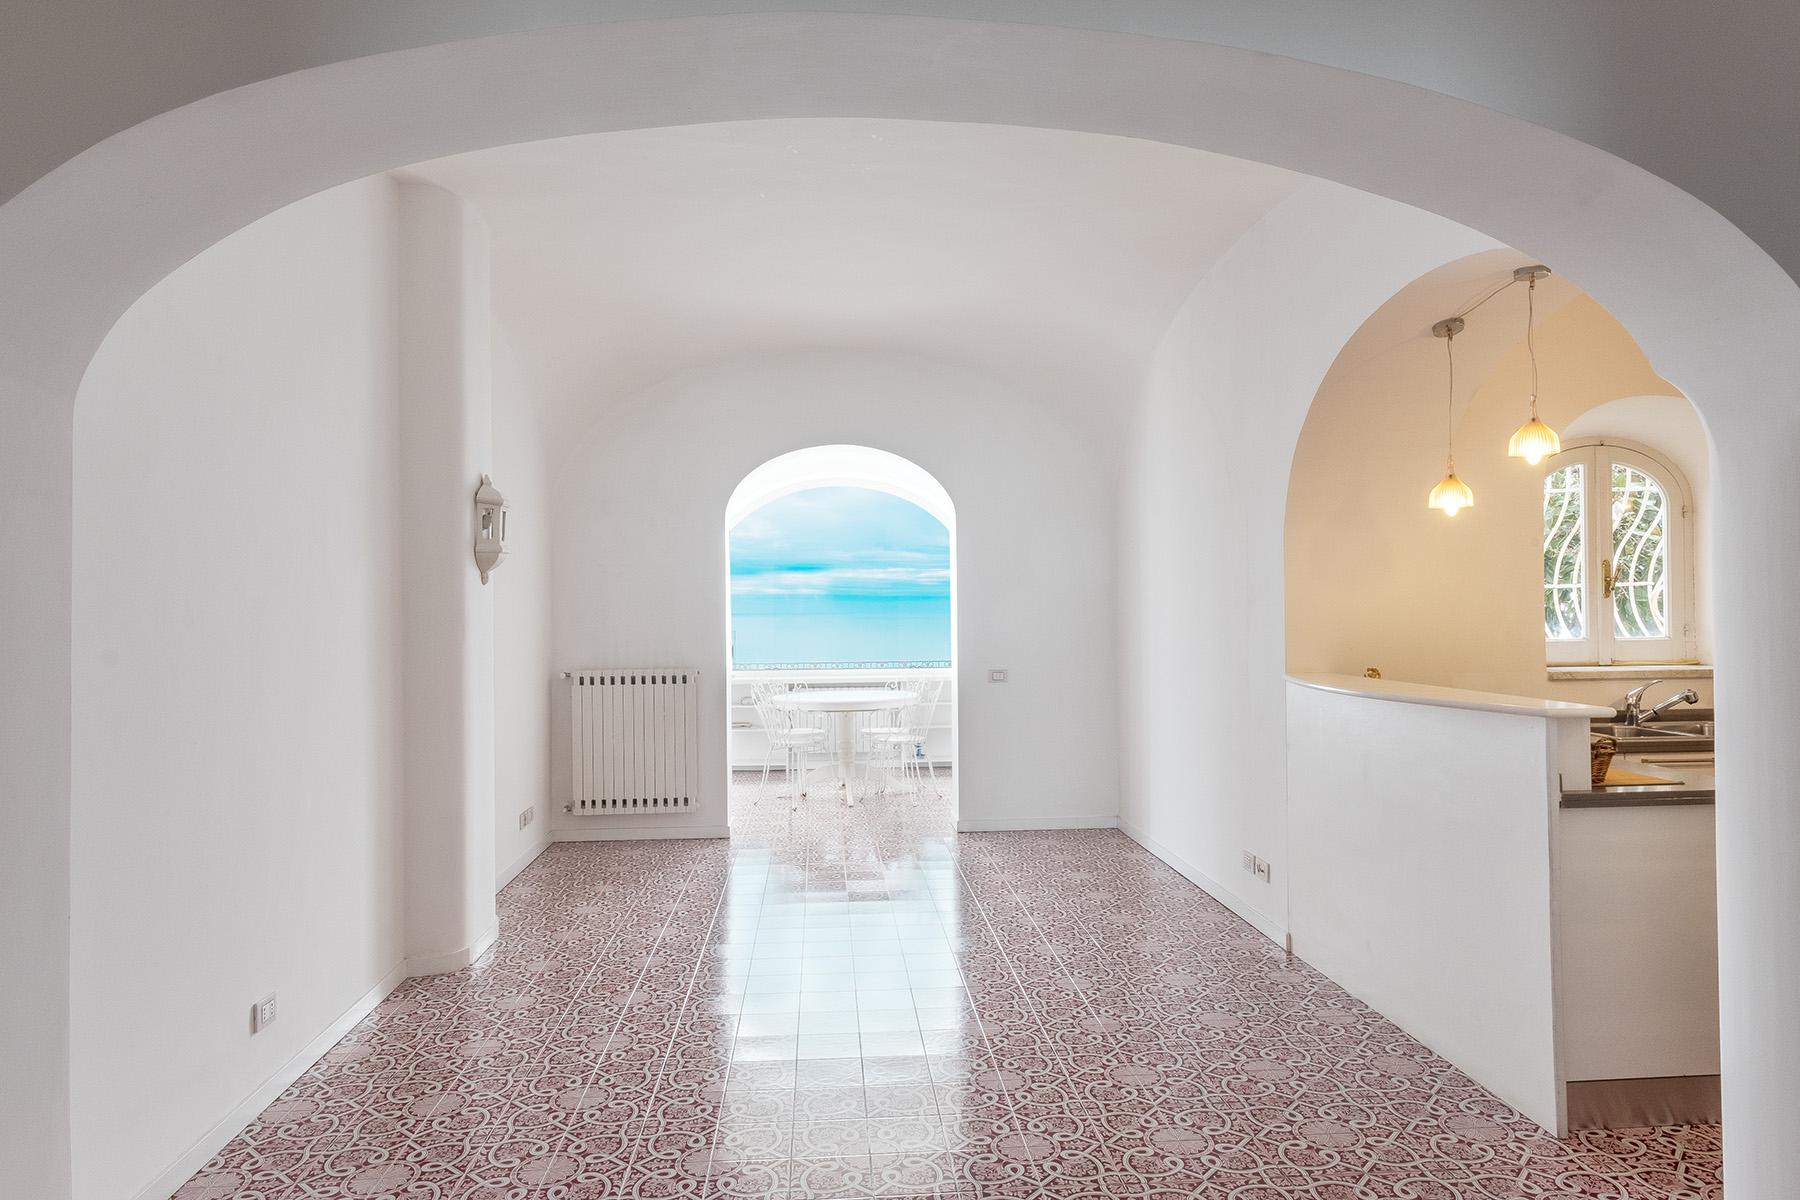 Casa indipendente in Vendita a Praiano: 4 locali, 250 mq - Foto 6